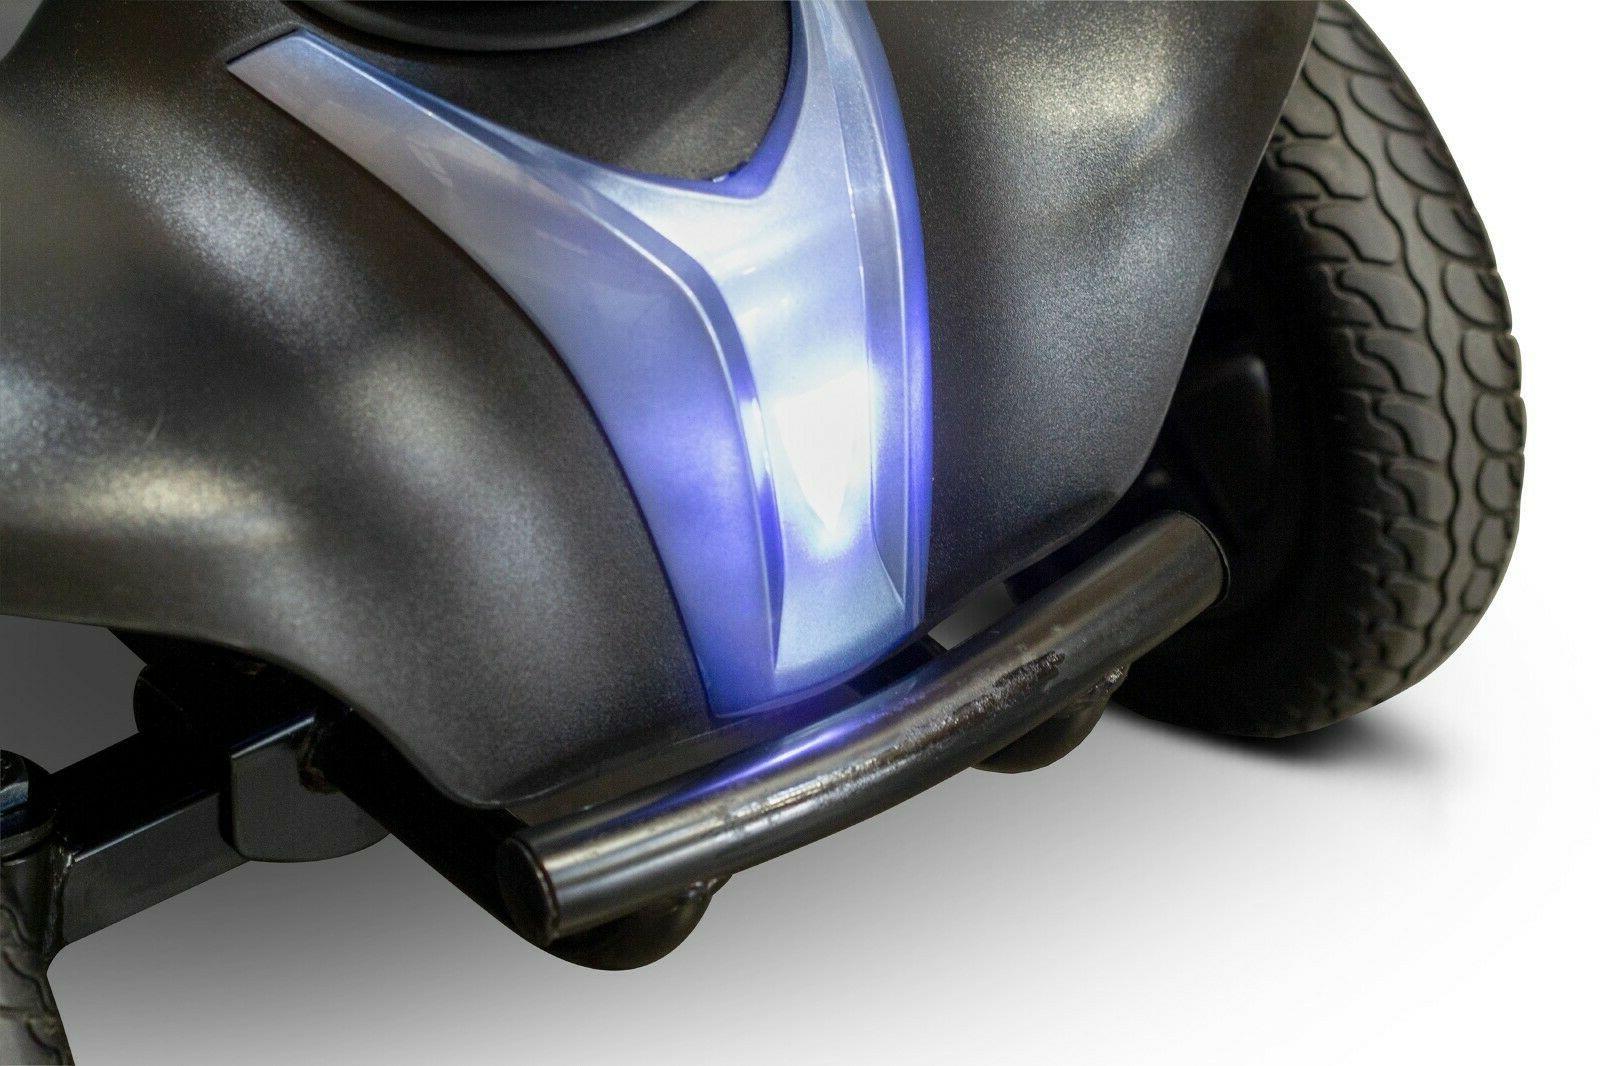 Blue EWheels Mobility Scooter, 300 lb Cap, 15 EZ Disassembly